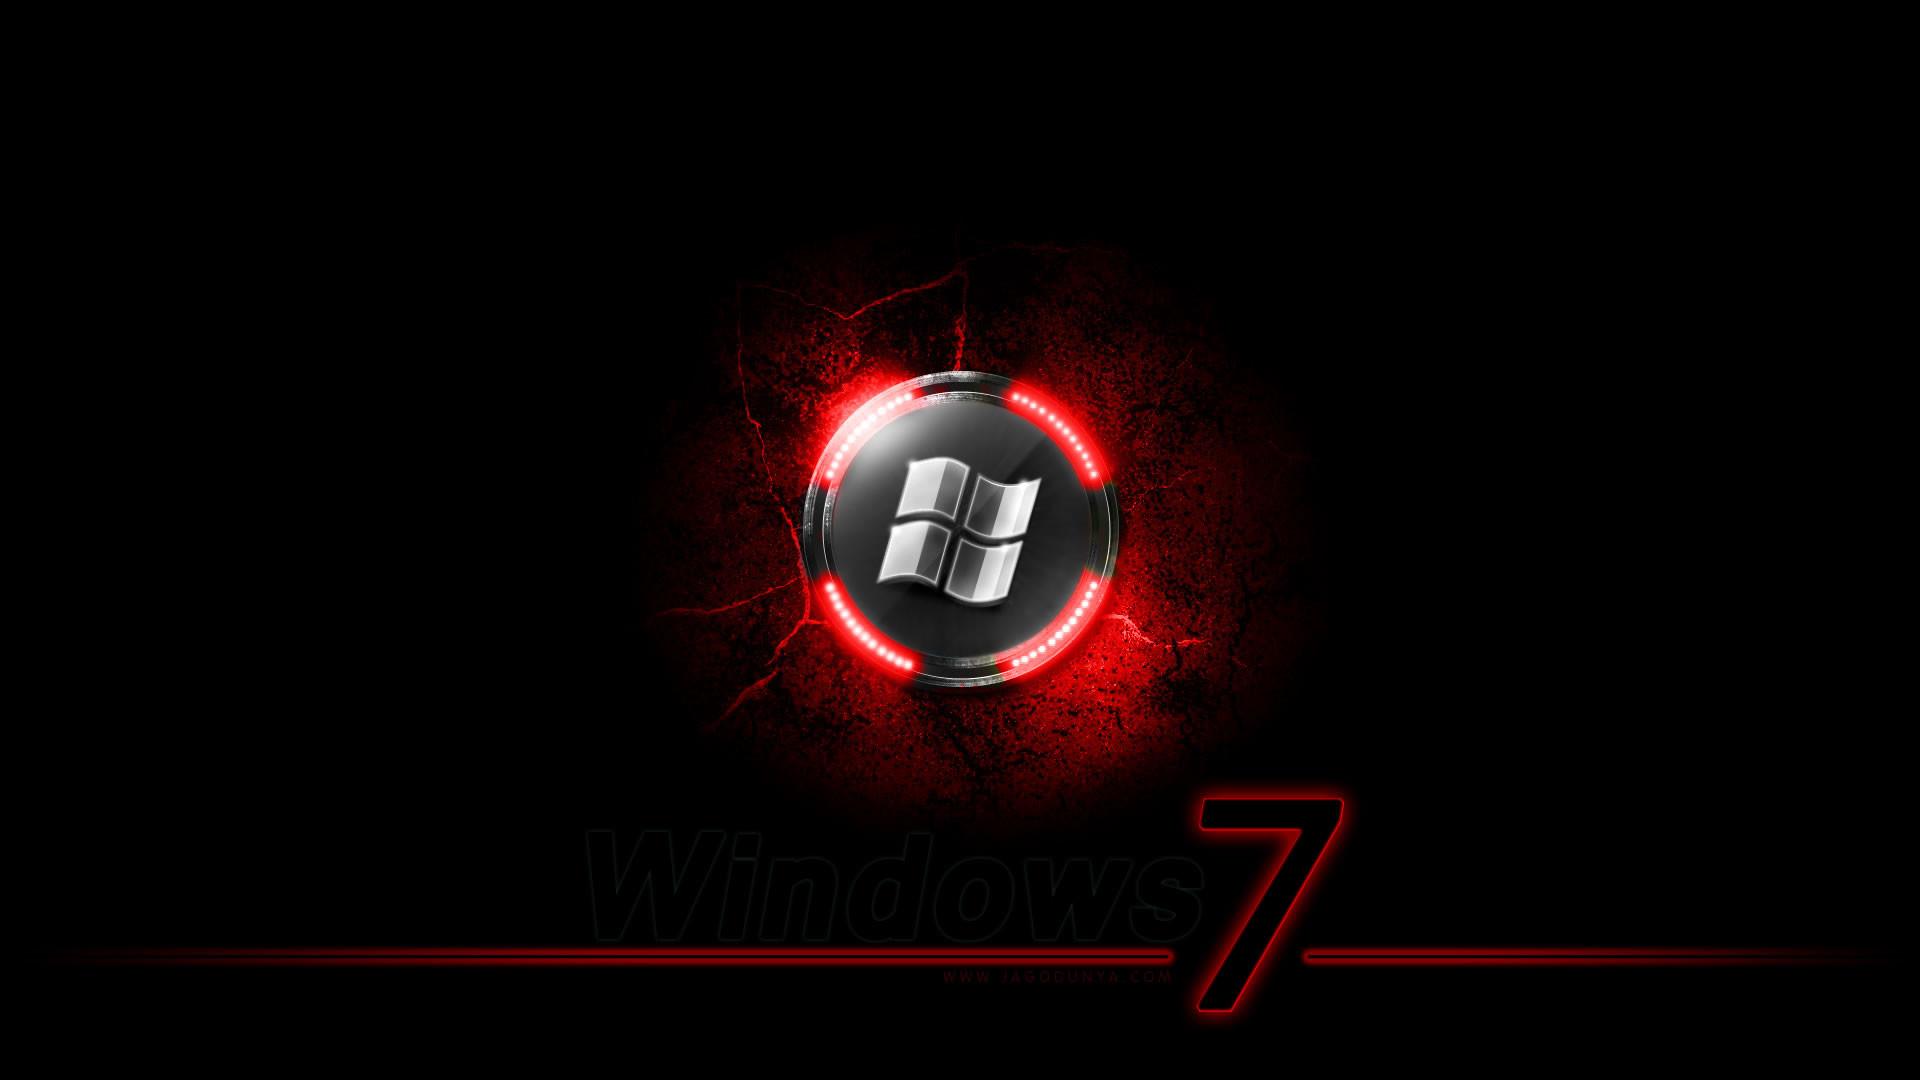 Black Windows 7 hd Wallpapers